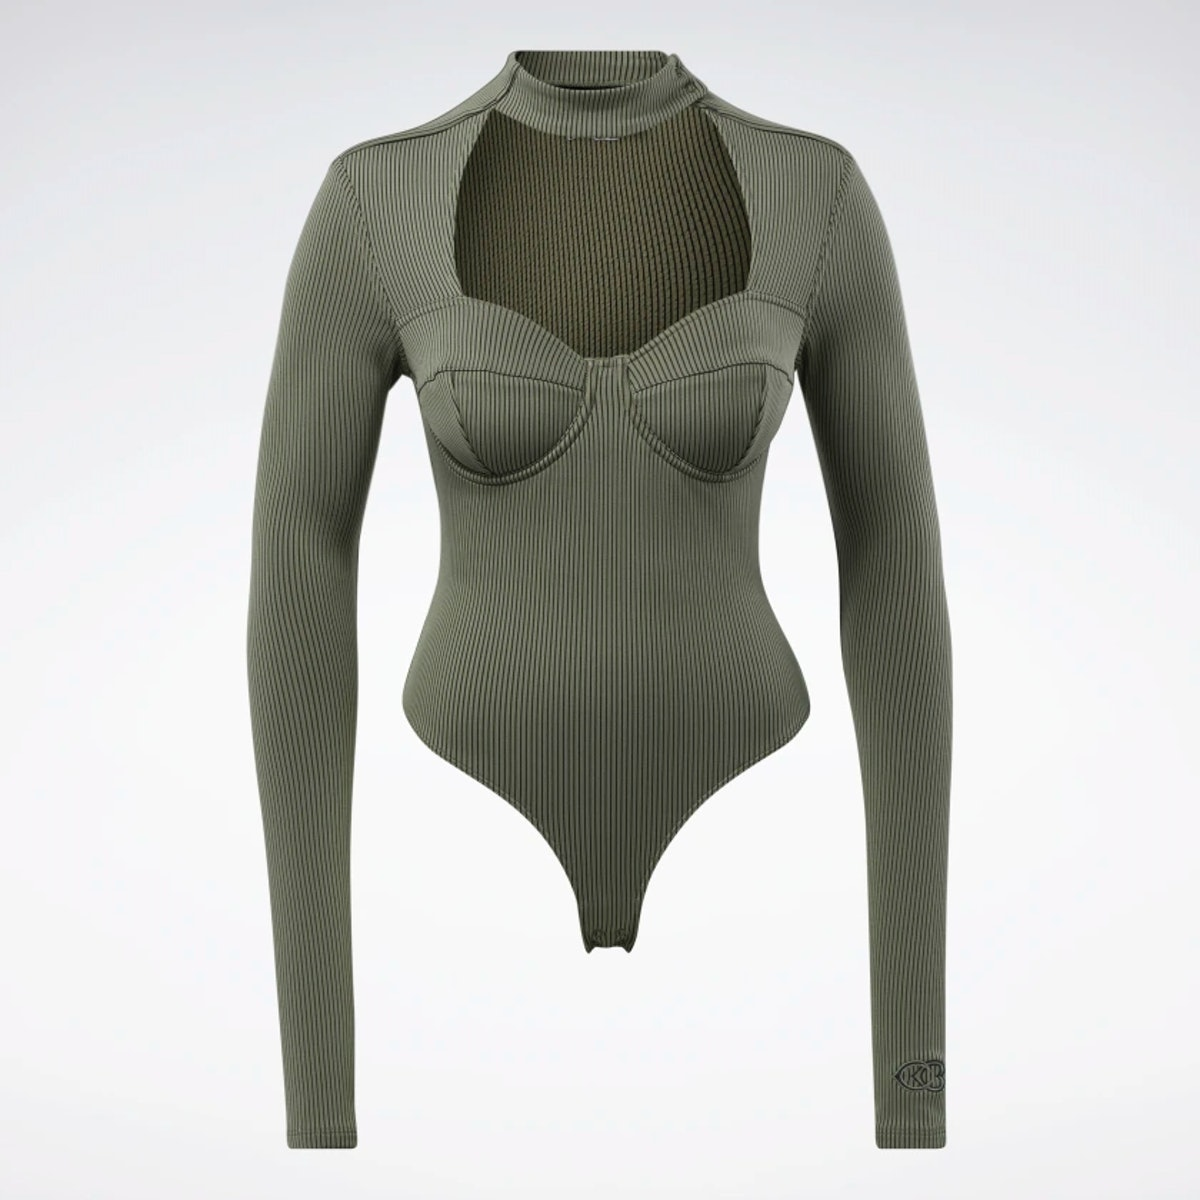 Cardi B's army green and black bodysuit.